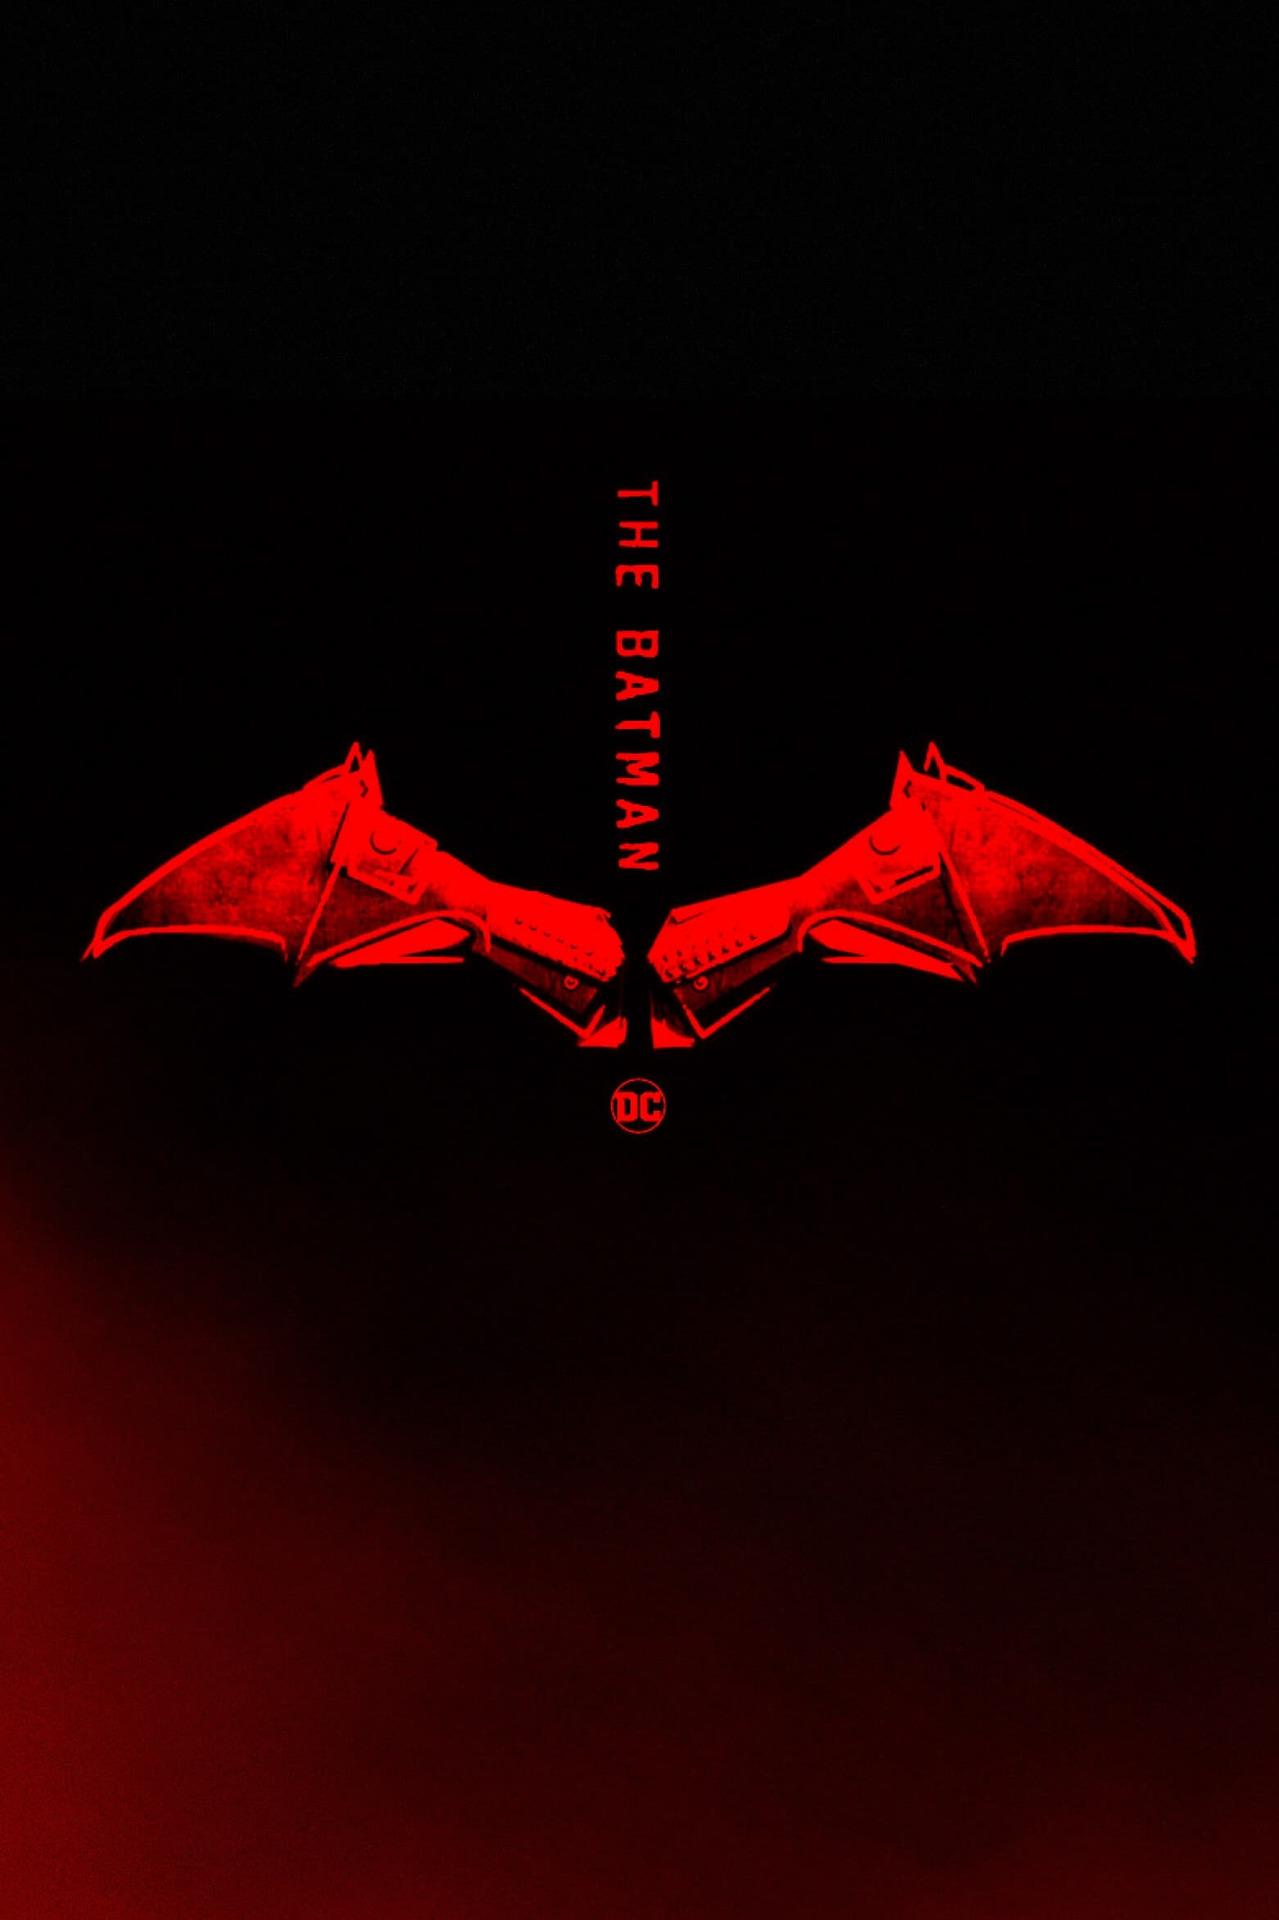 Постер фильма Бэтмен The Batman 2021